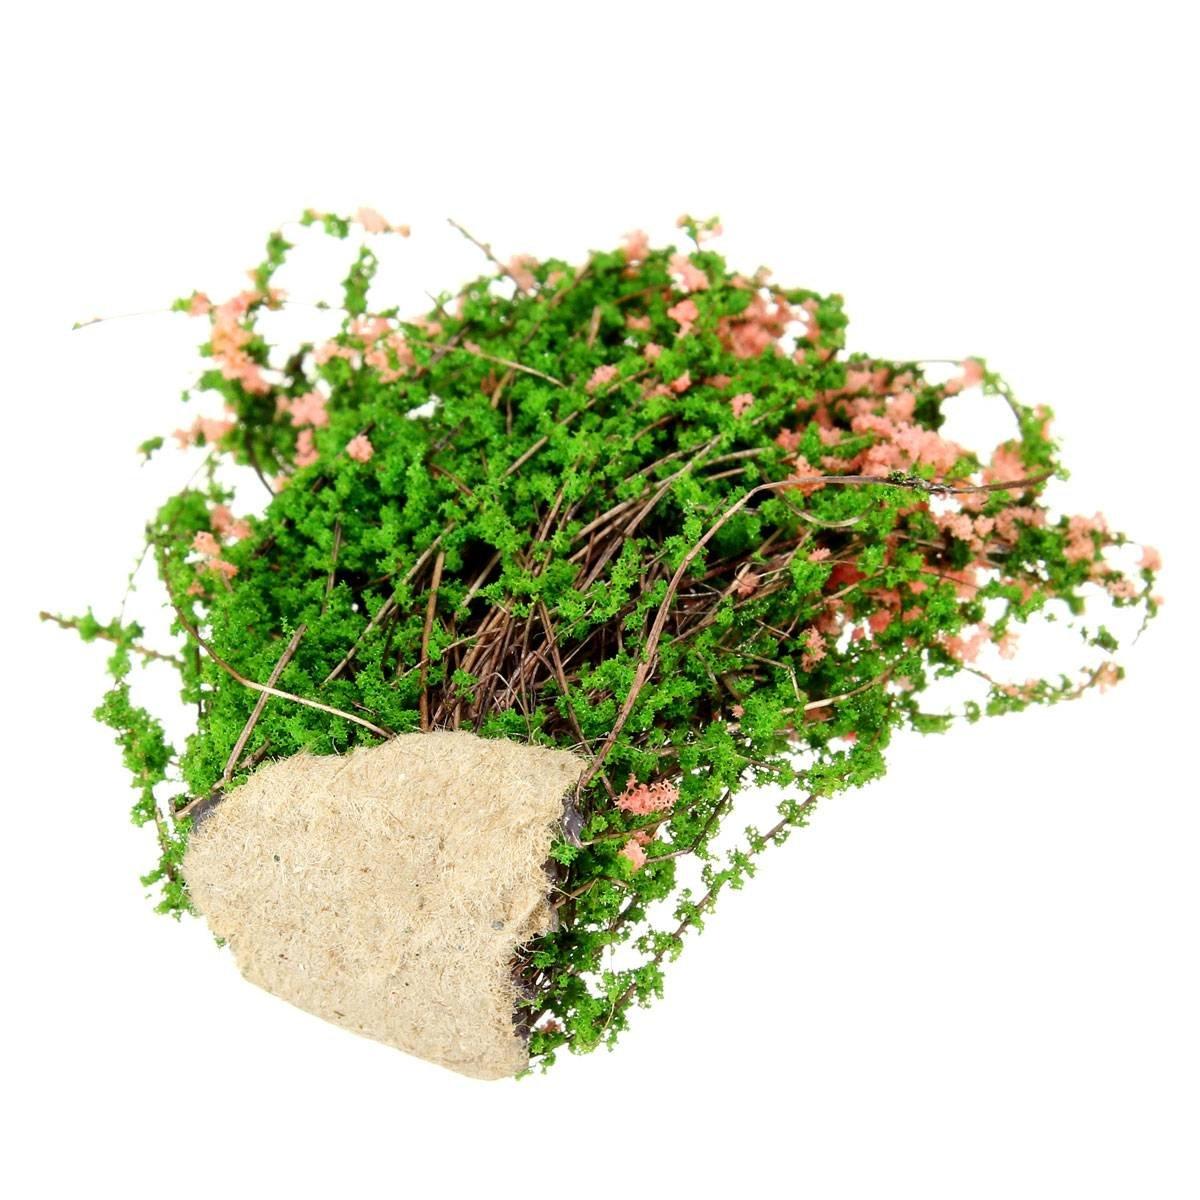 Miniature plants fairy garden accessories dollhouse - Miniature plants for fairy gardens ...